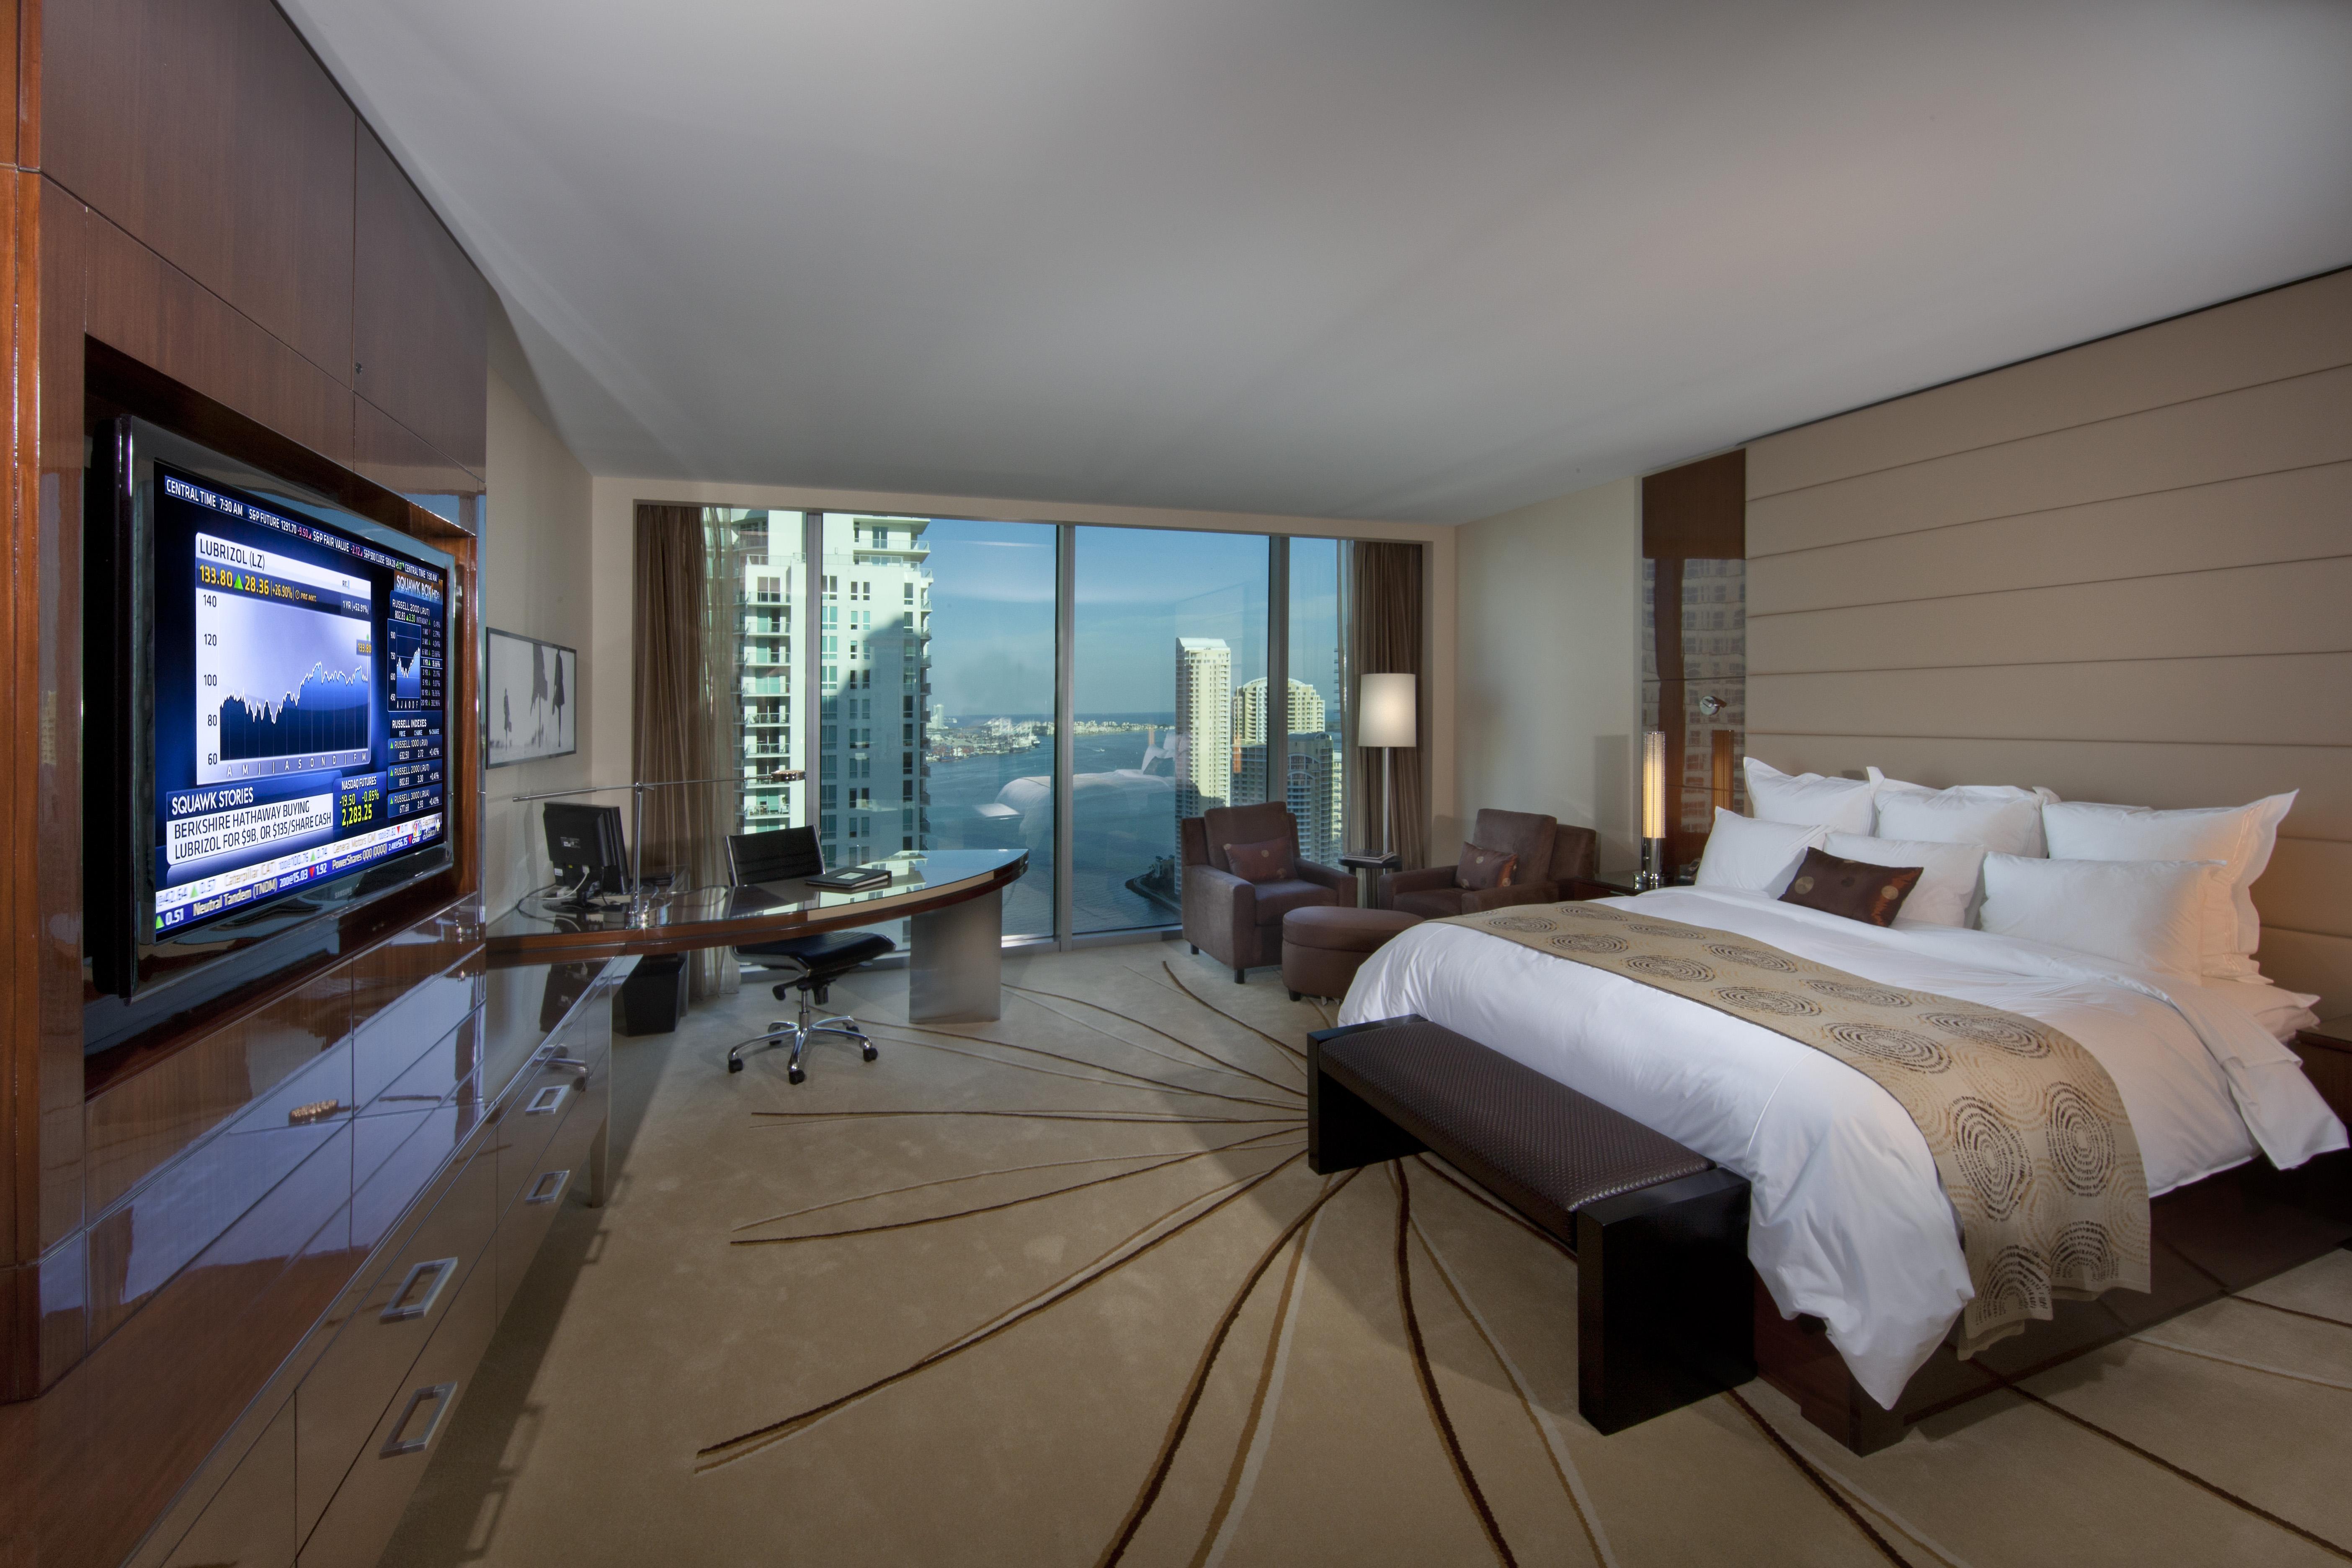 JW Marriott Marquis Miami FL   Hotel Reviews   TripAdvisor   HD 5616x3744